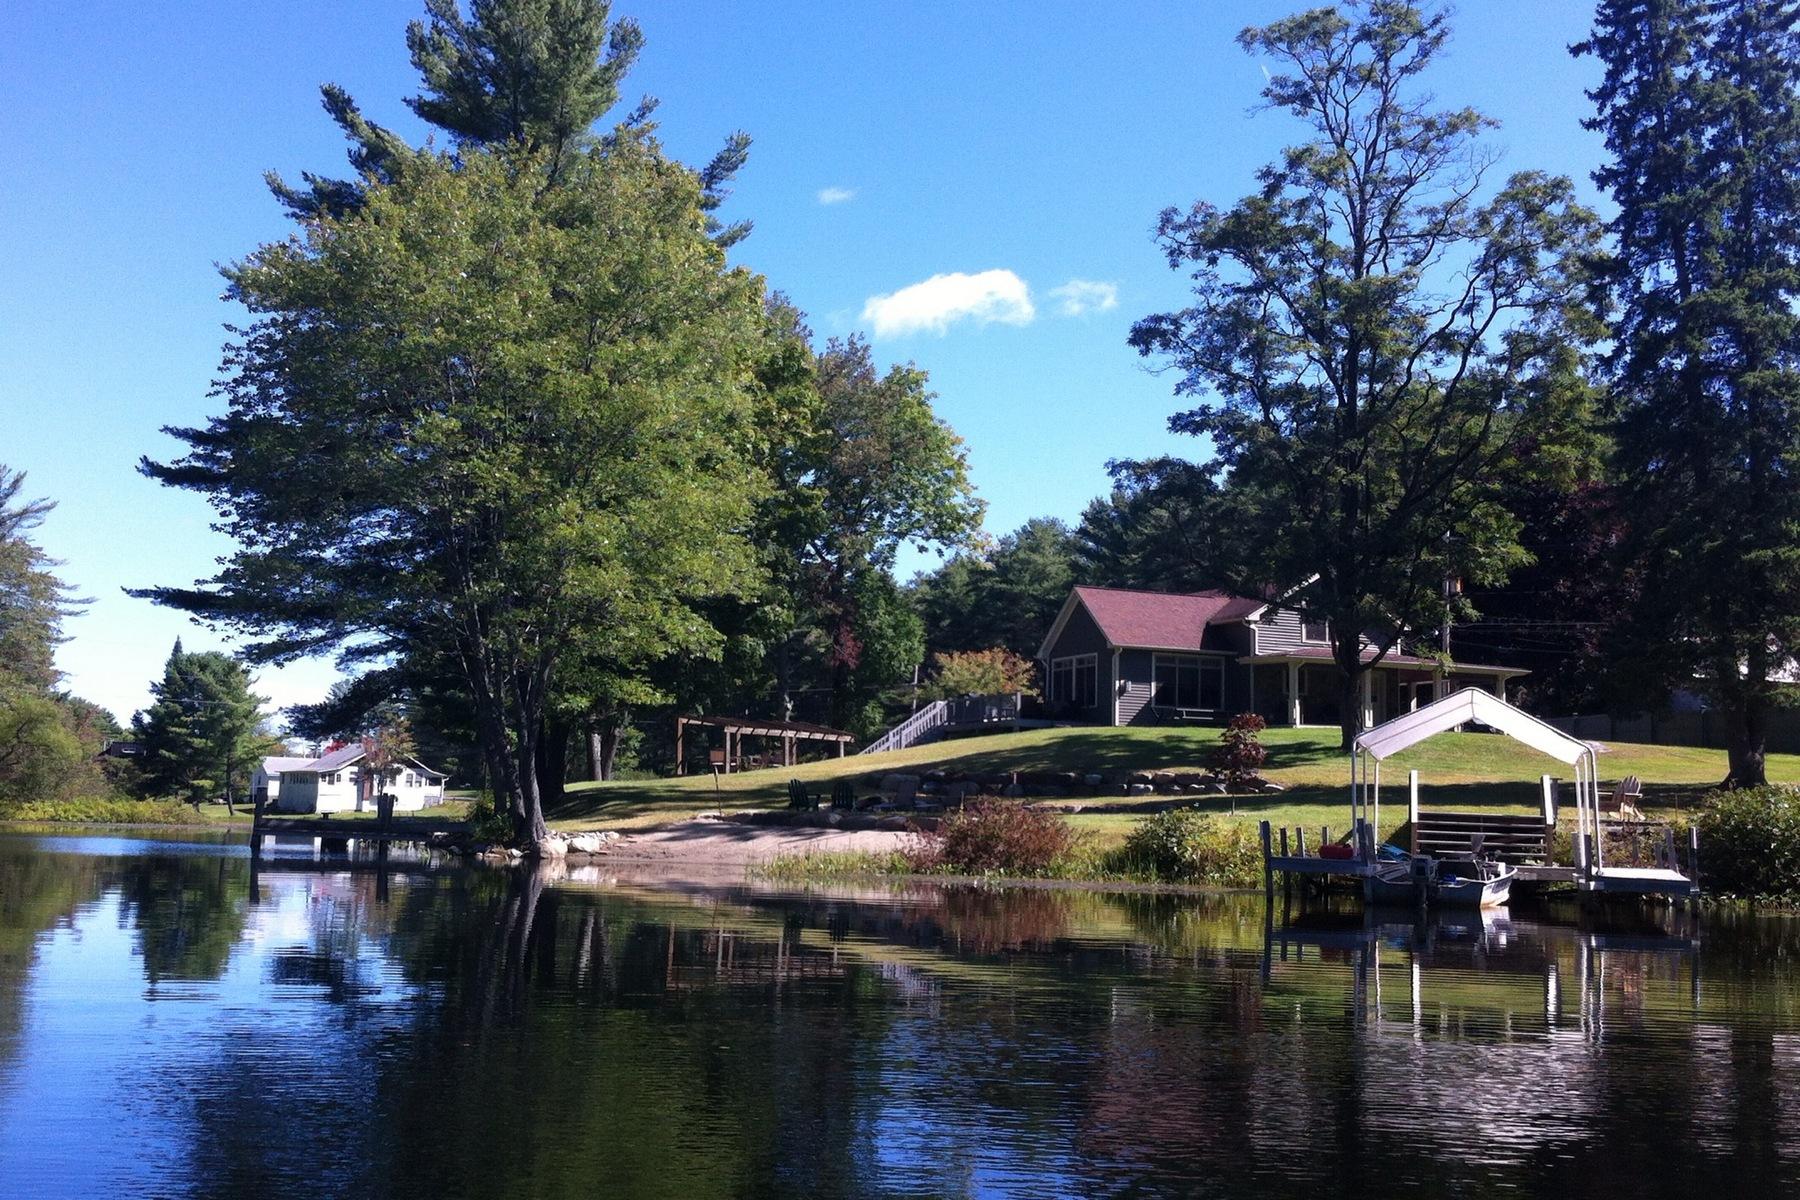 Частный односемейный дом для того Продажа на Brant Lake Cottage 6653 State Route8 Horicon, Нью-Йорк 12815 Соединенные Штаты